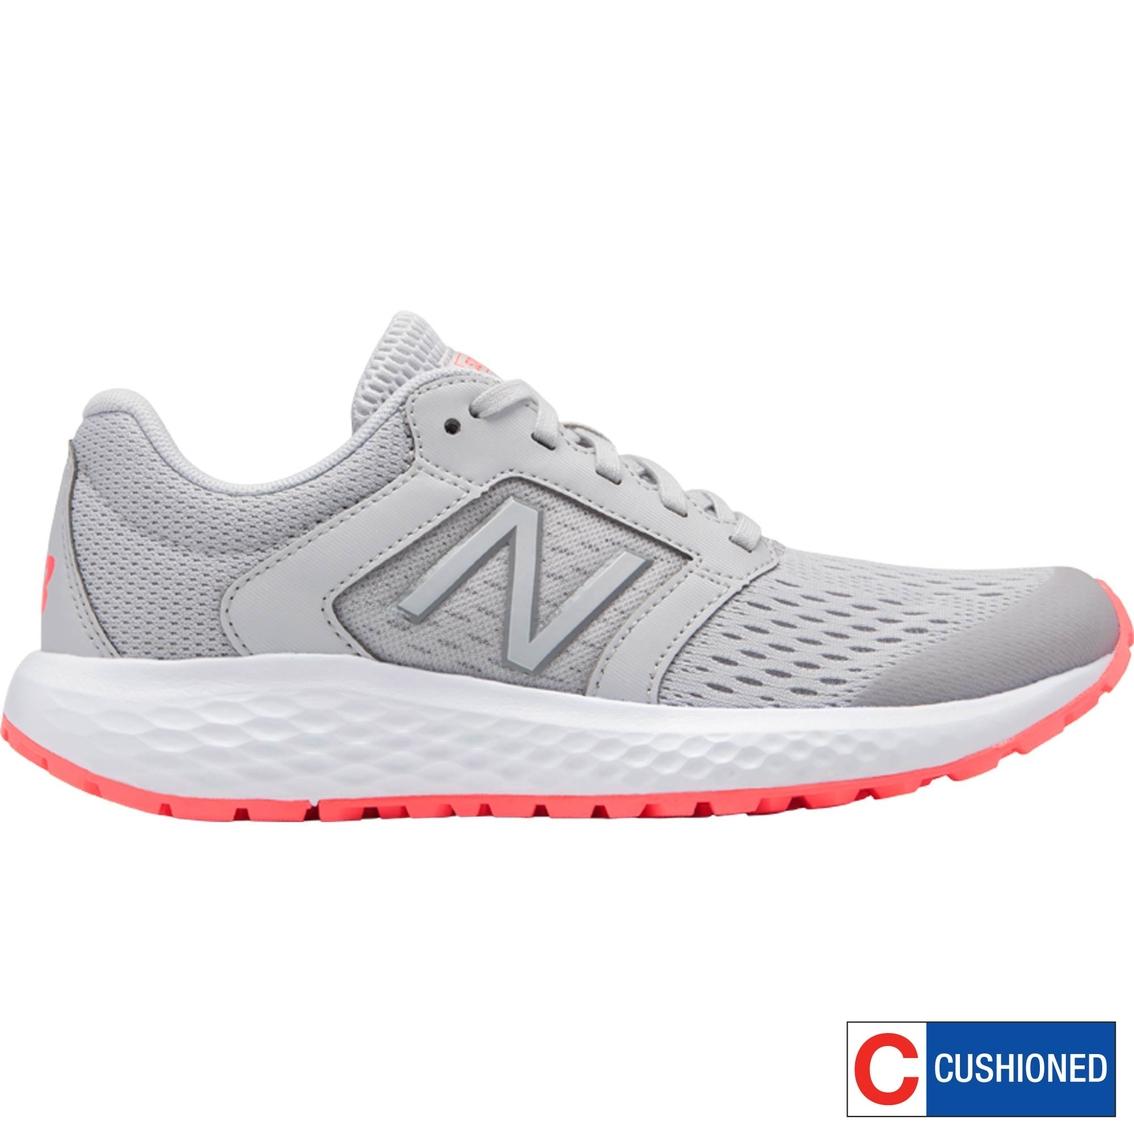 New Balance Women s W520ls5 520v5 Running Shoes  764f59066